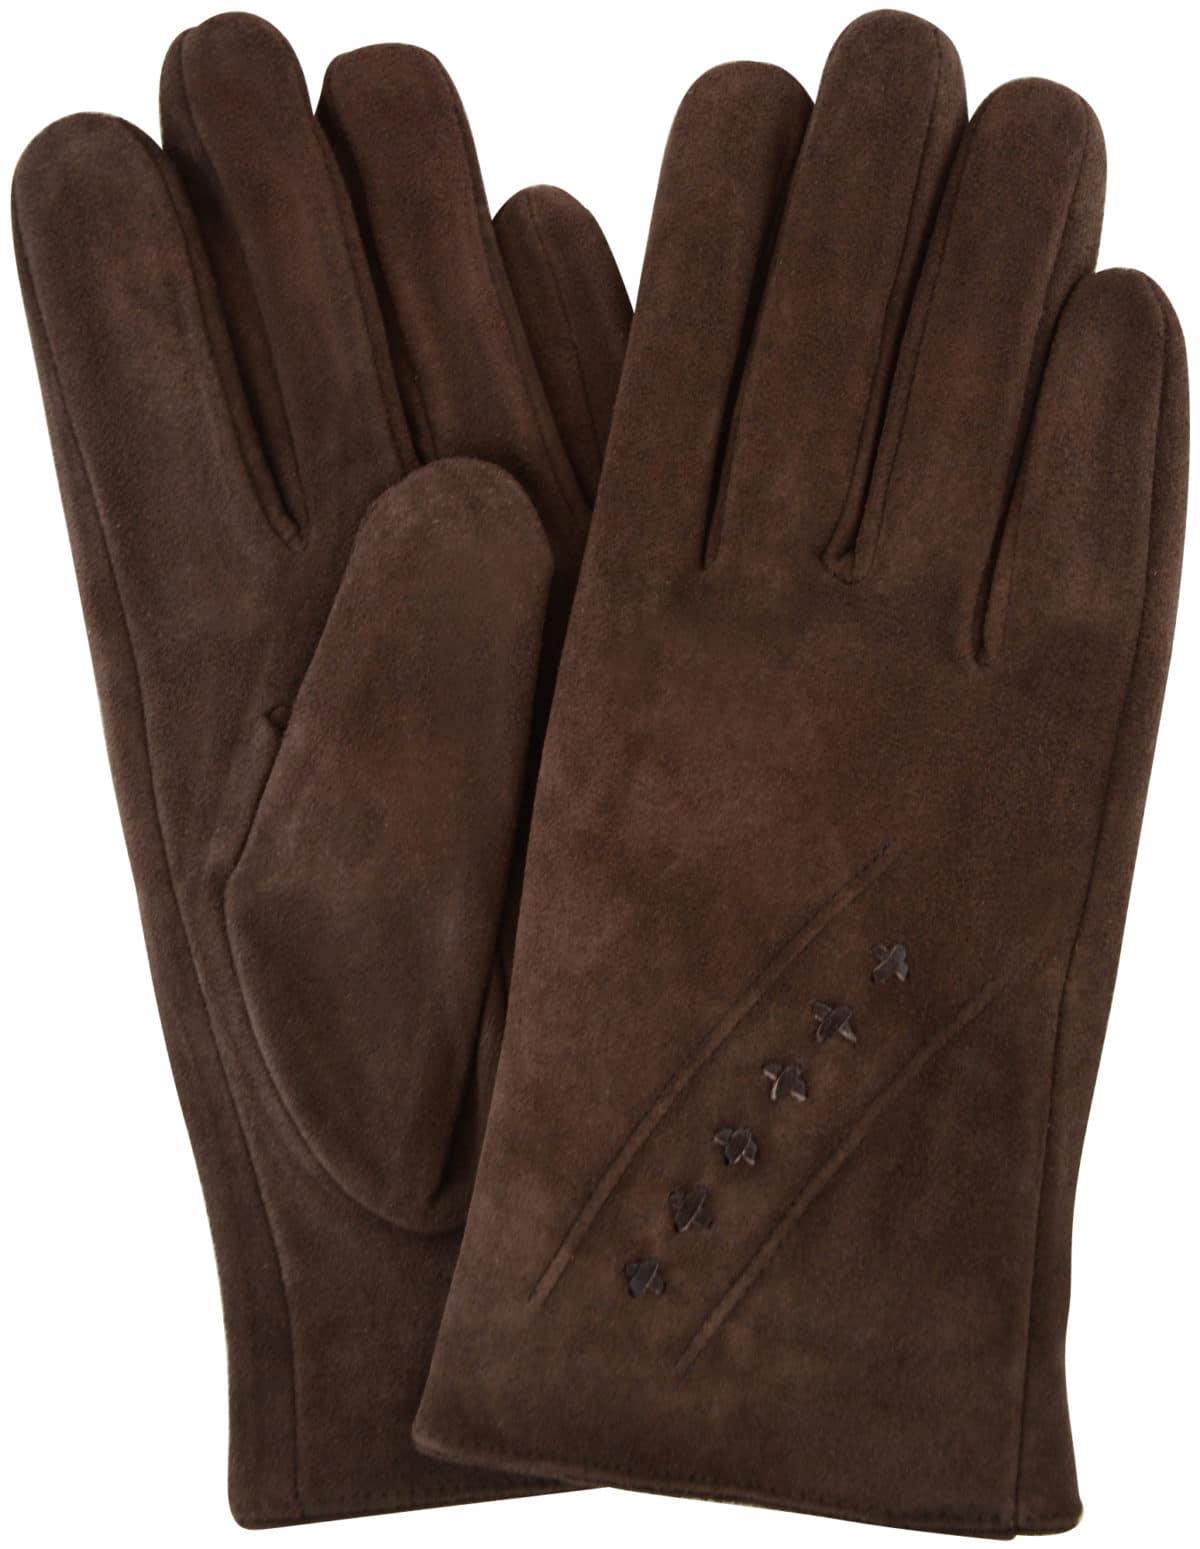 Suede Gloves Fleece Lining and Stitch Design - Brown